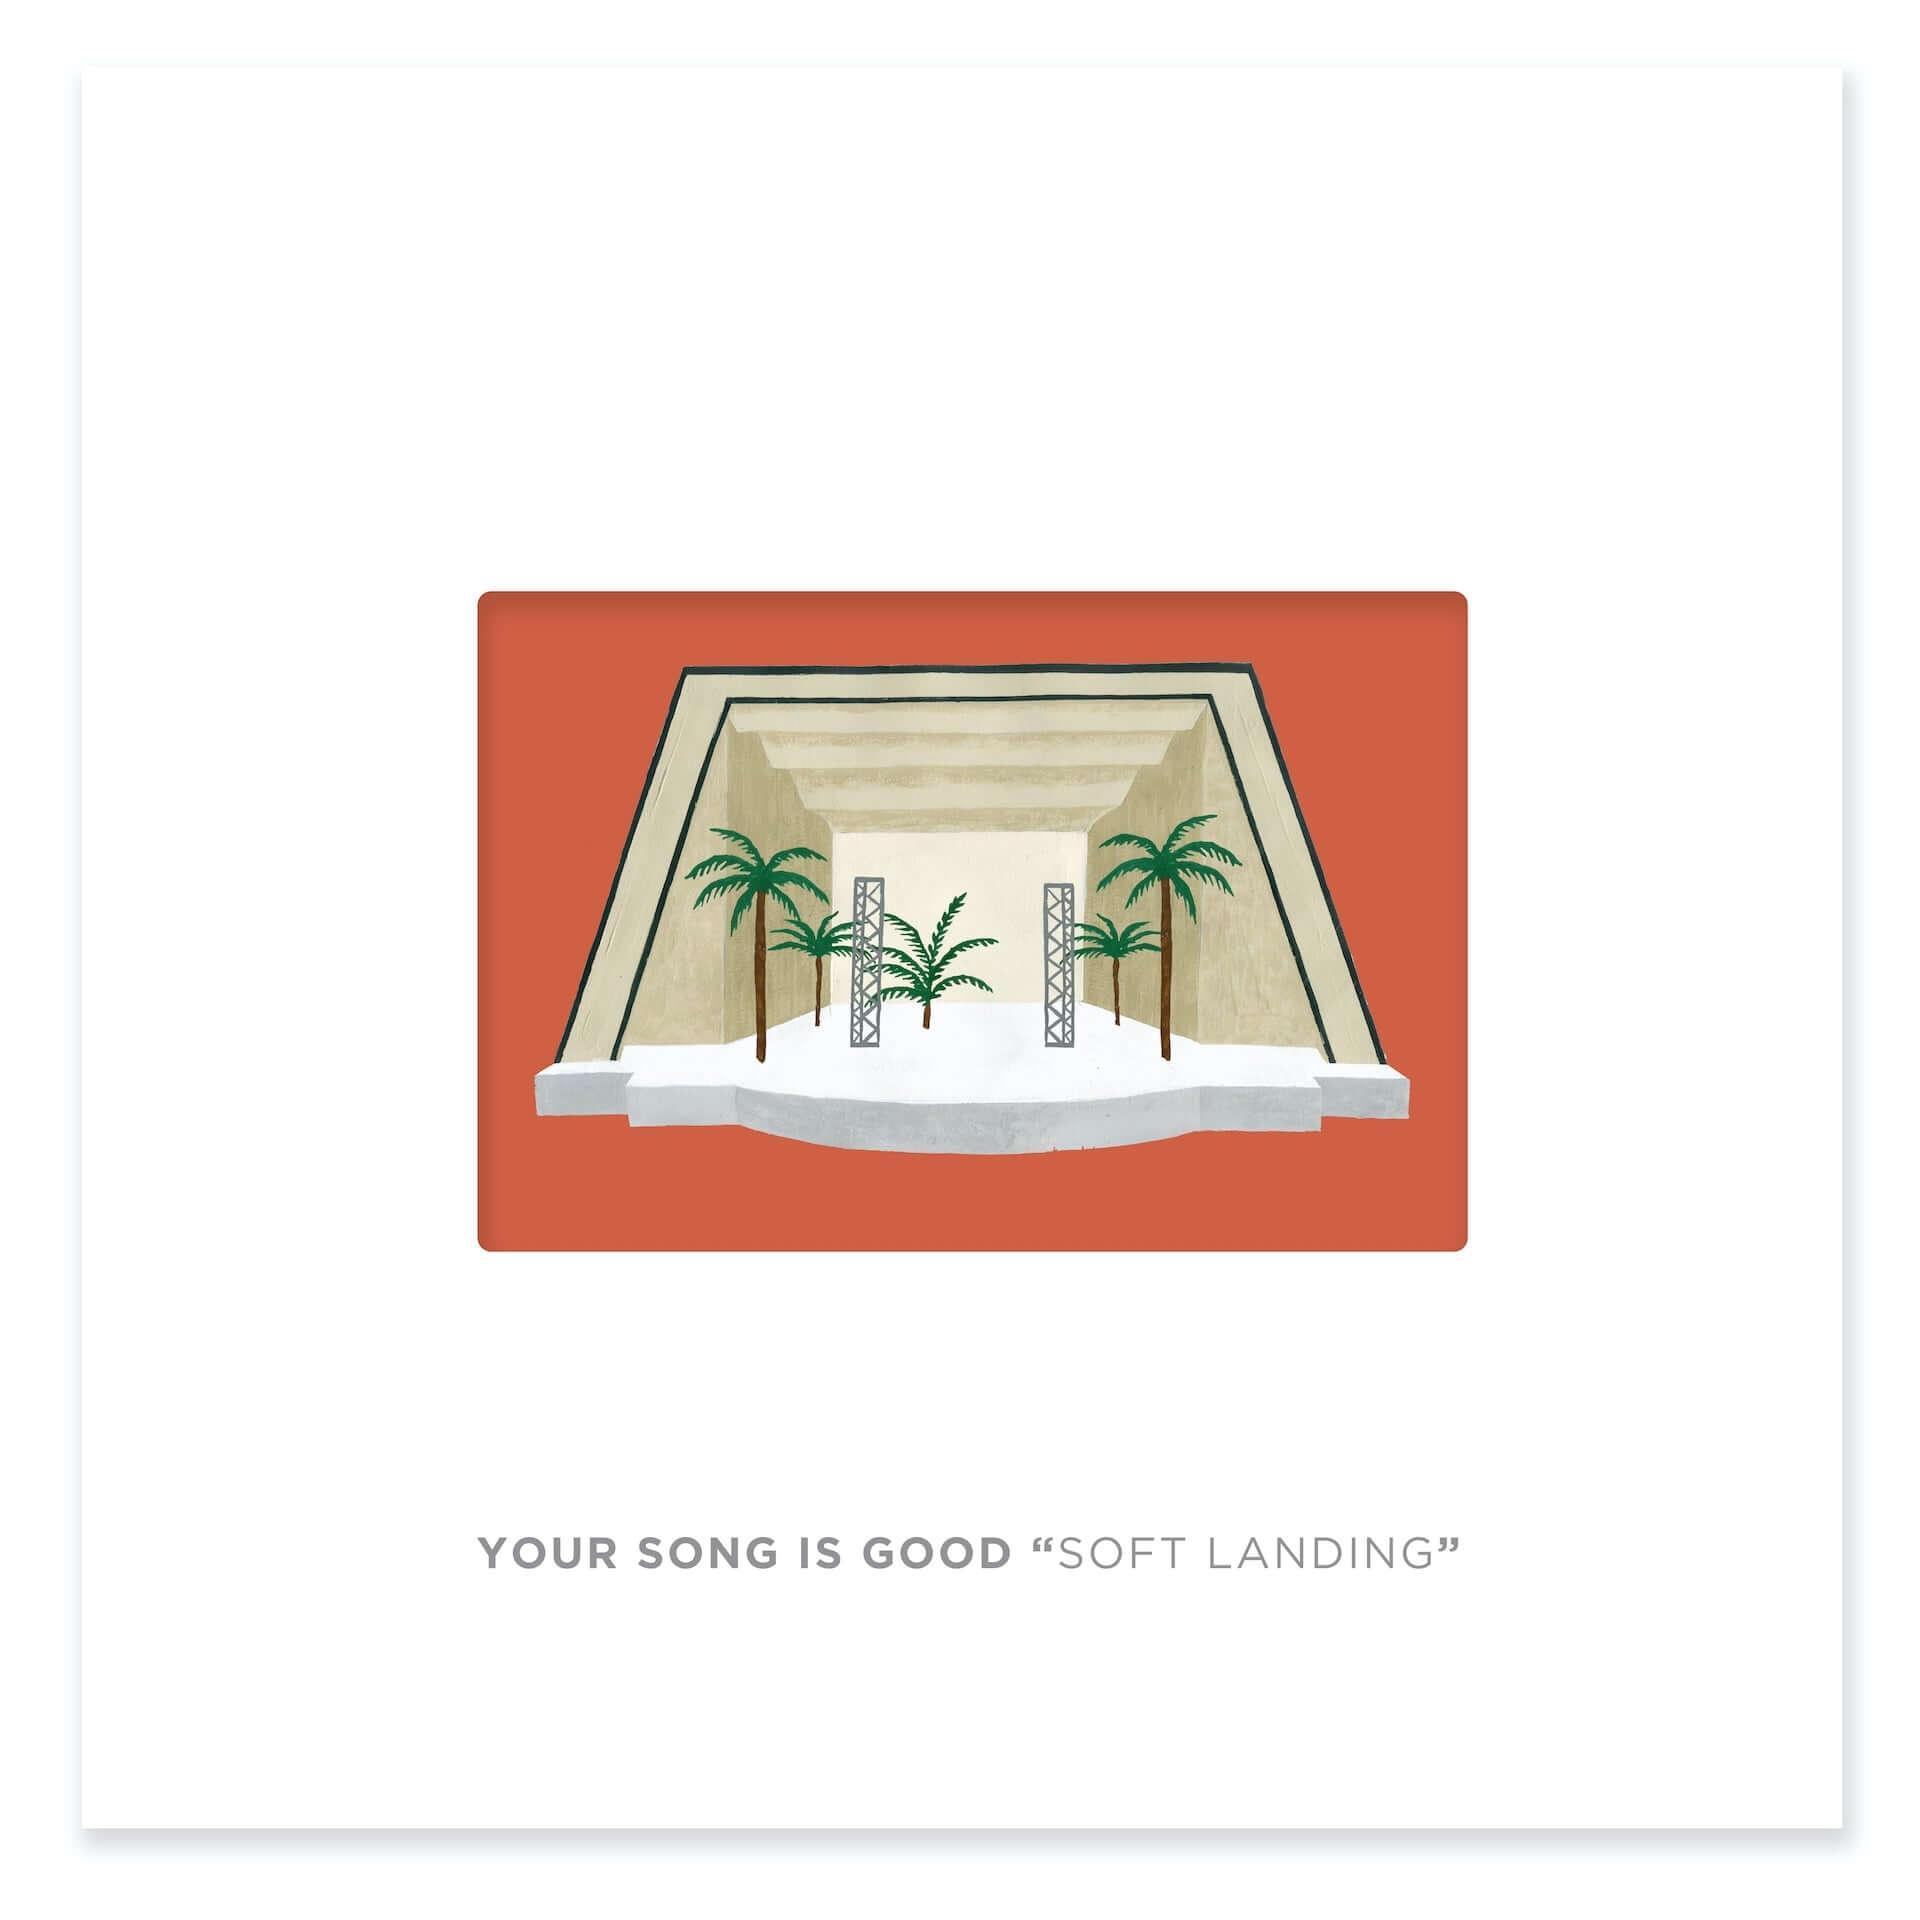 YOUR SONG IS GOOD結成20周年を記念した日比谷野音でのワンマン<SOFT LANDING>がBlu-ray化決定! music200803_yoursongisgood_13-1920x1920